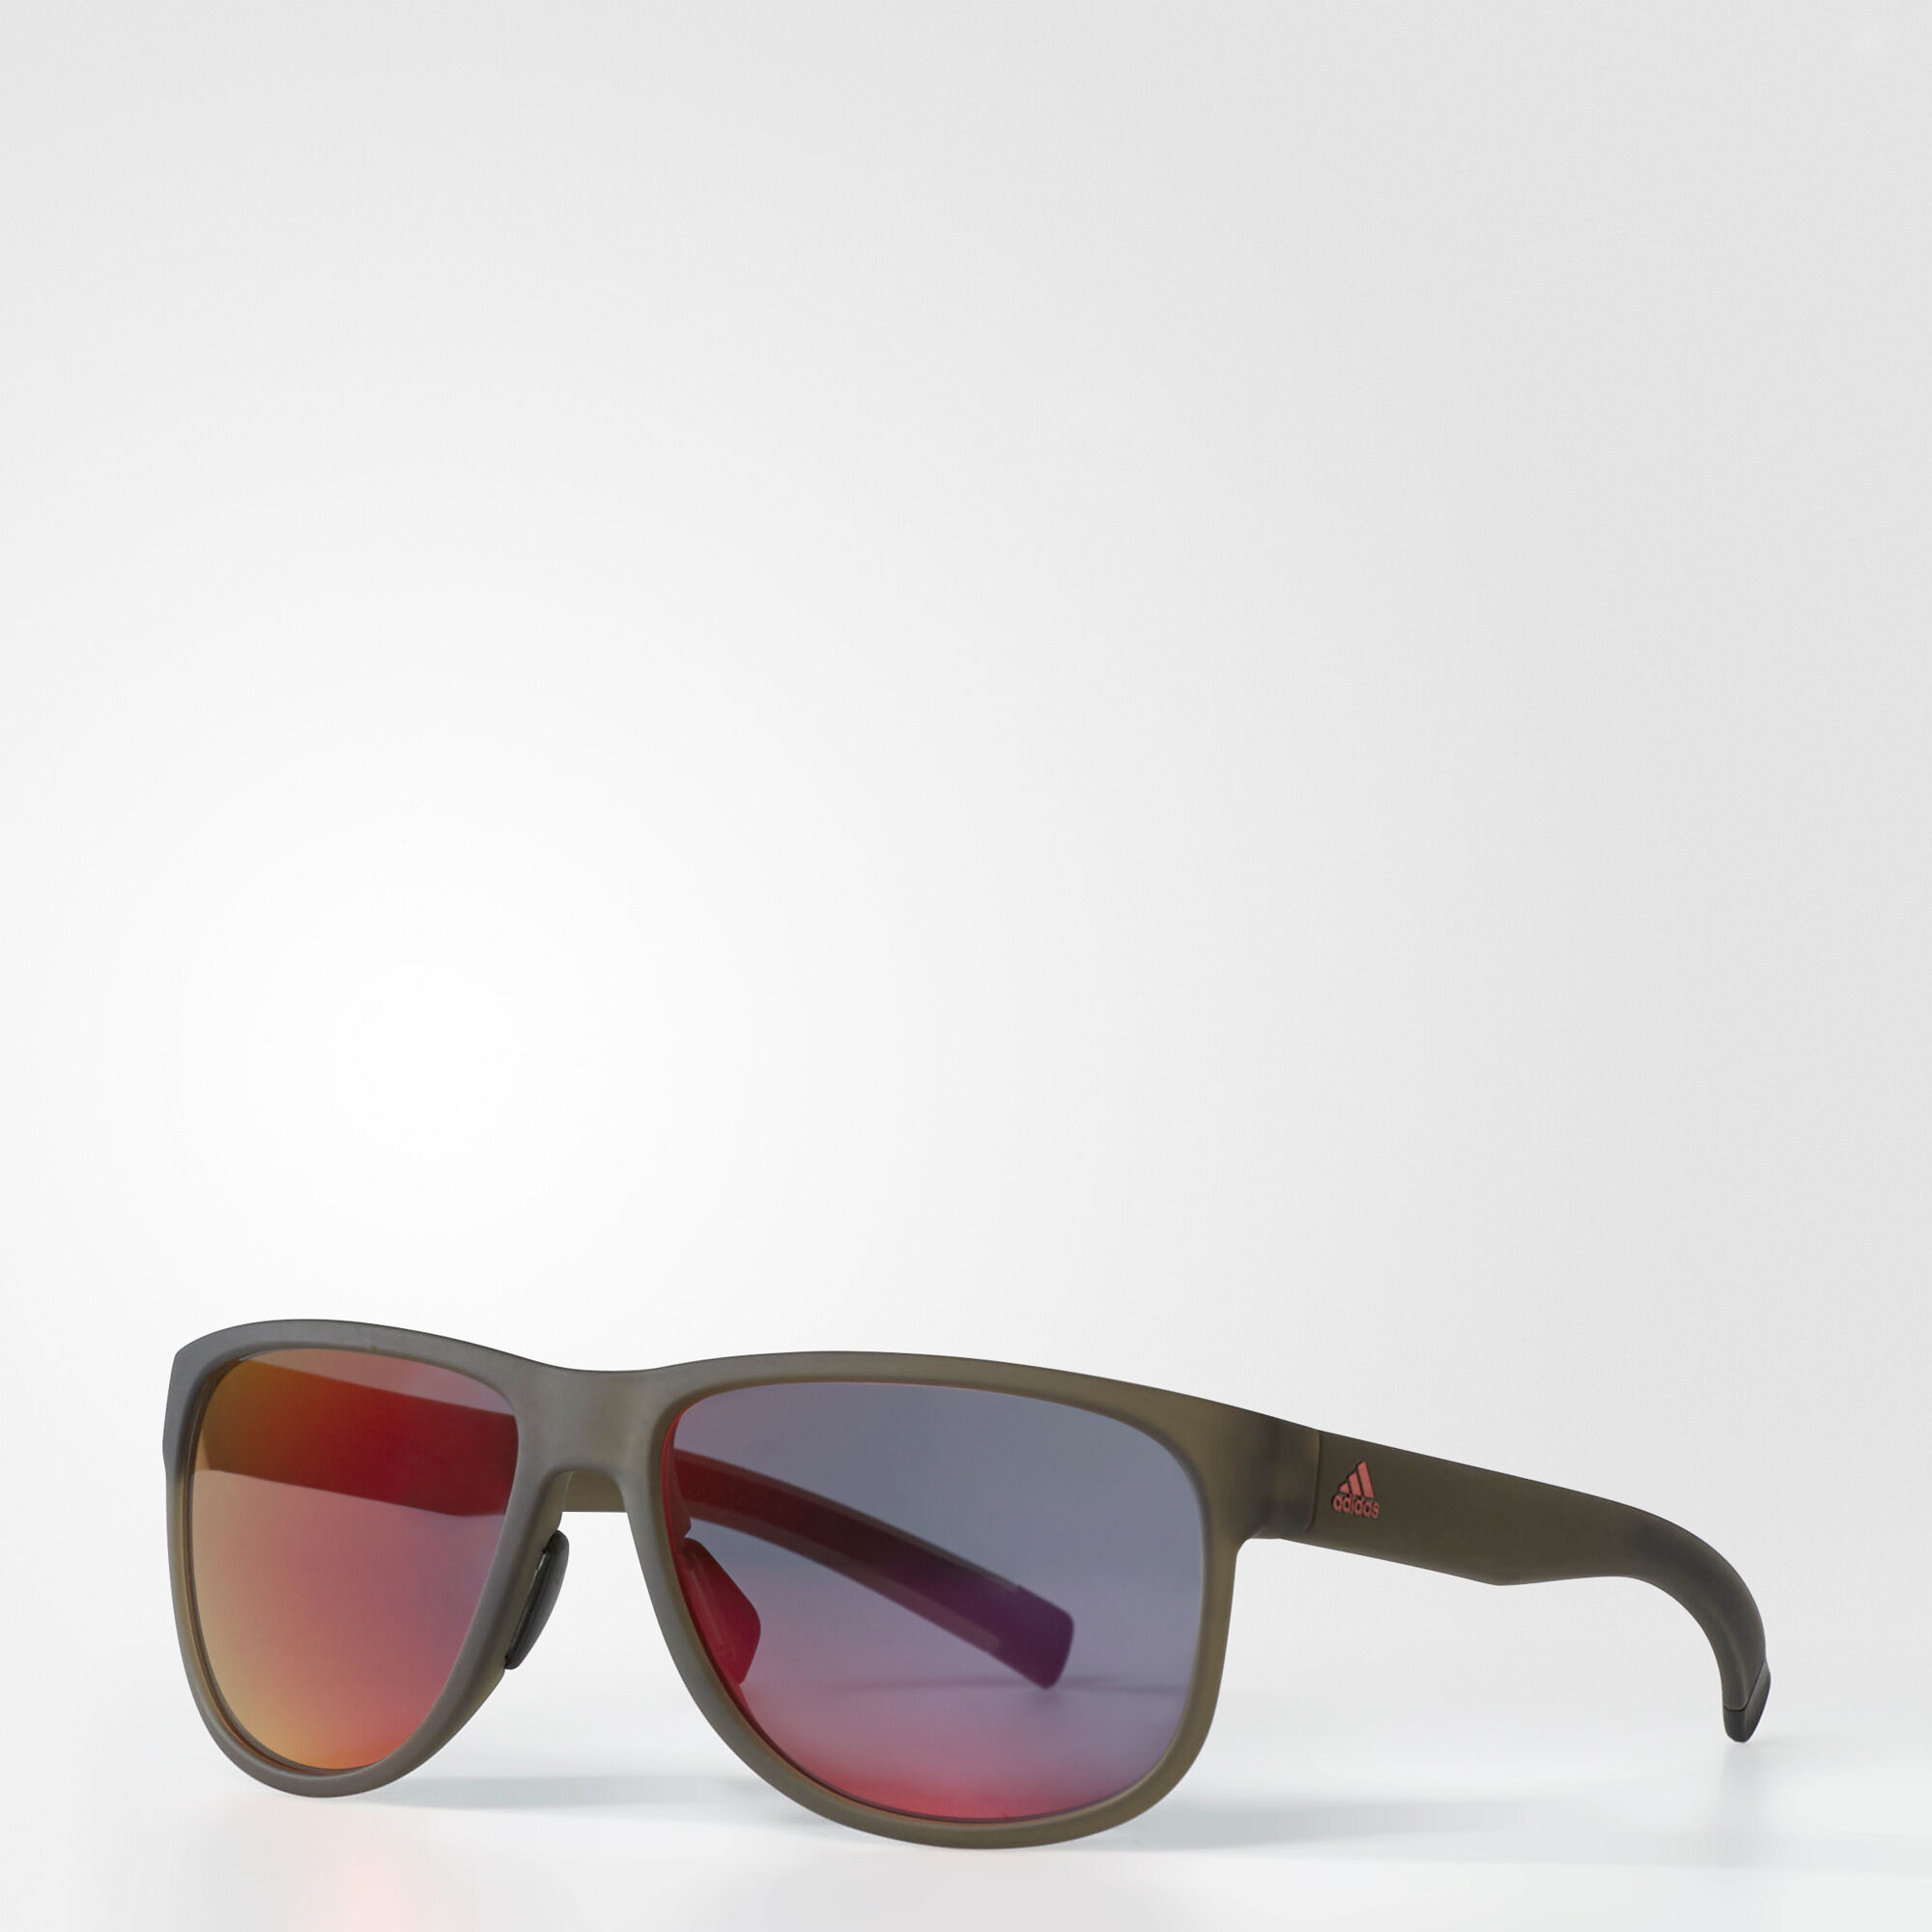 adidas sunglasses  adidas Sunglasses \u0026 Eyewear